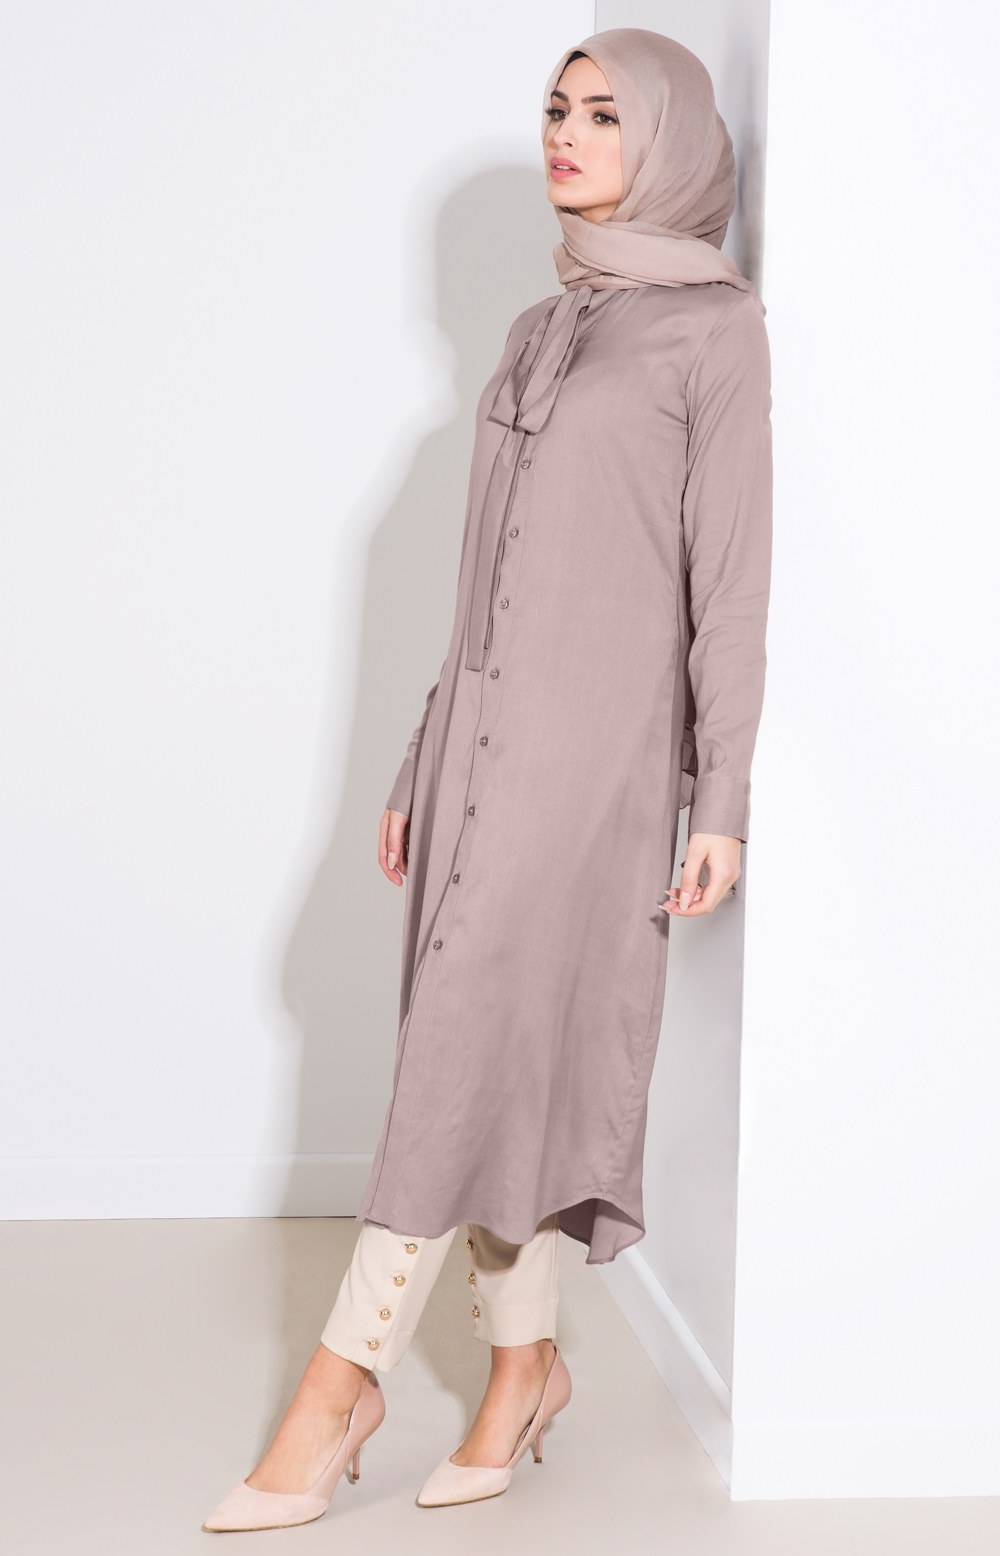 Model Trend Baju Lebaran Sekarang 9fdy 25 Trend Model Baju Muslim Lebaran 2018 Simple & Modis